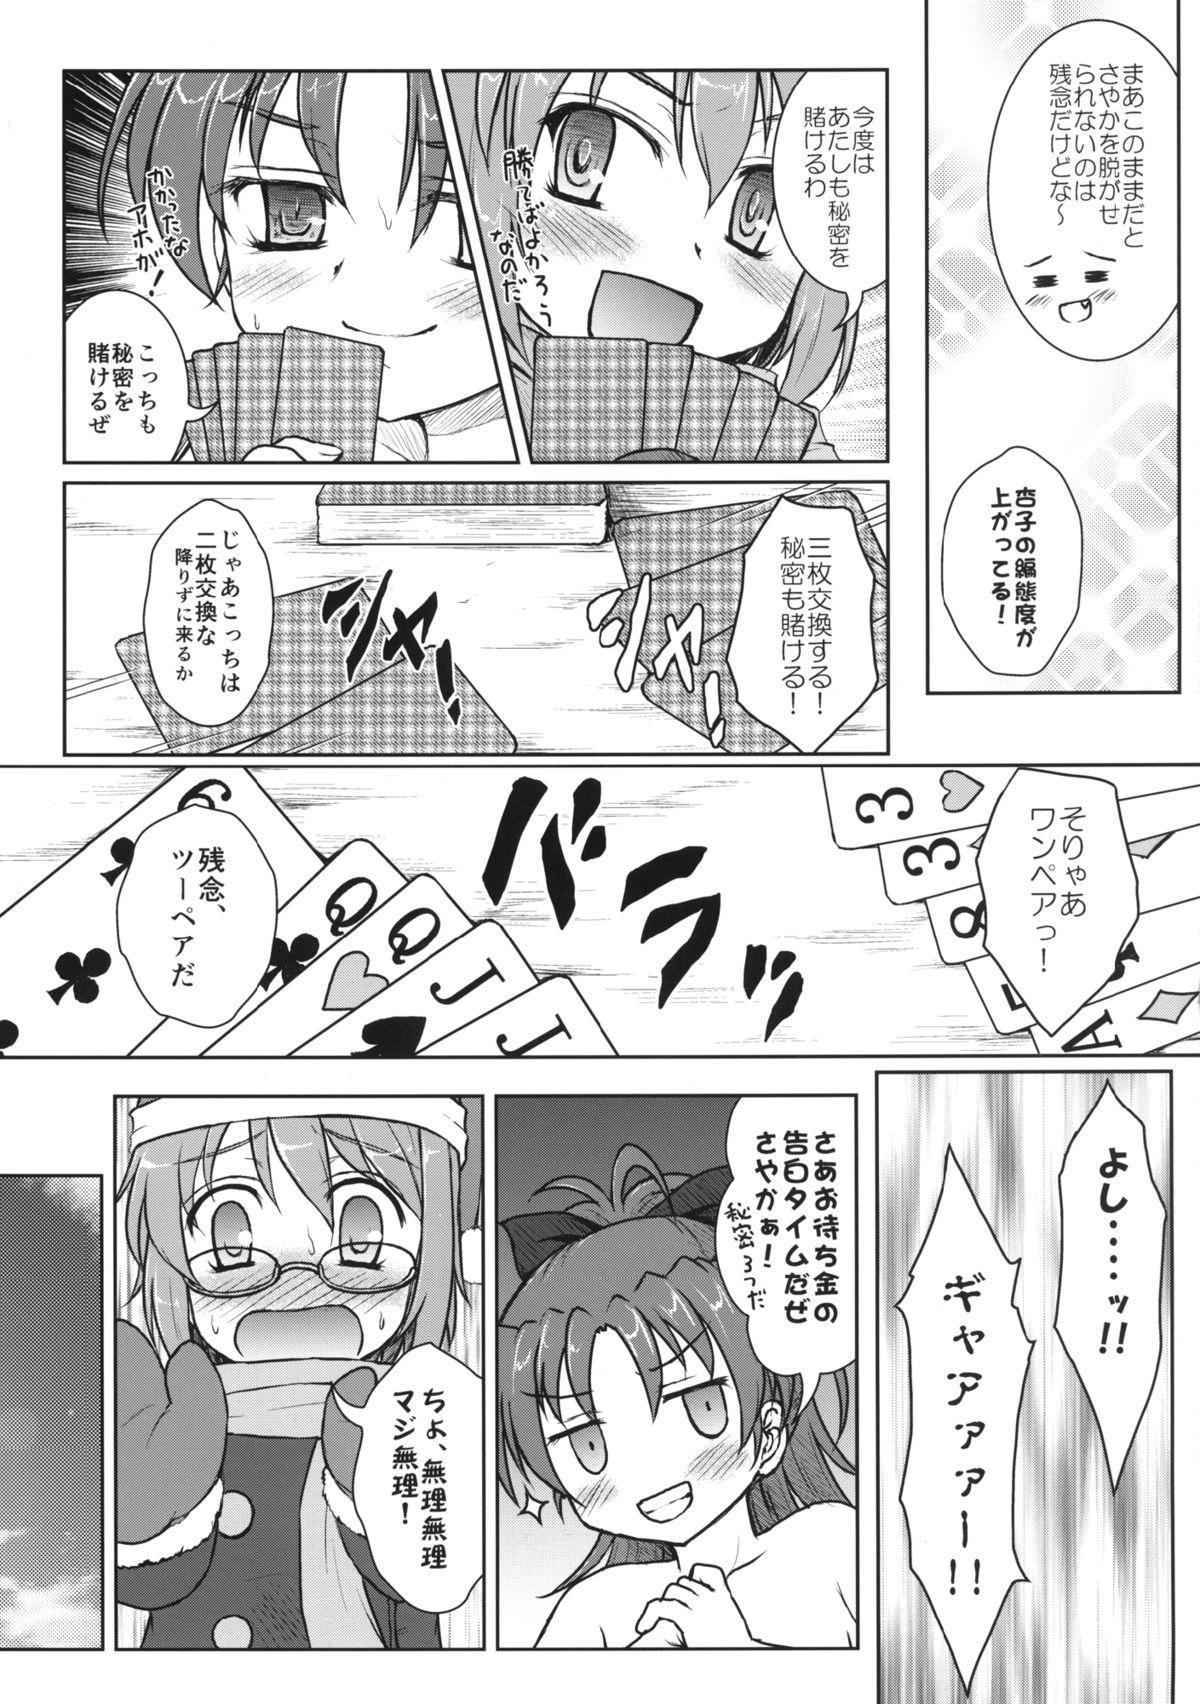 (SHT2013 Haru) [Newtype Kenkyuujo (Kotowari)] Sayaka-san to Kyouko-san (Puella Magi Madoka Magica) 18